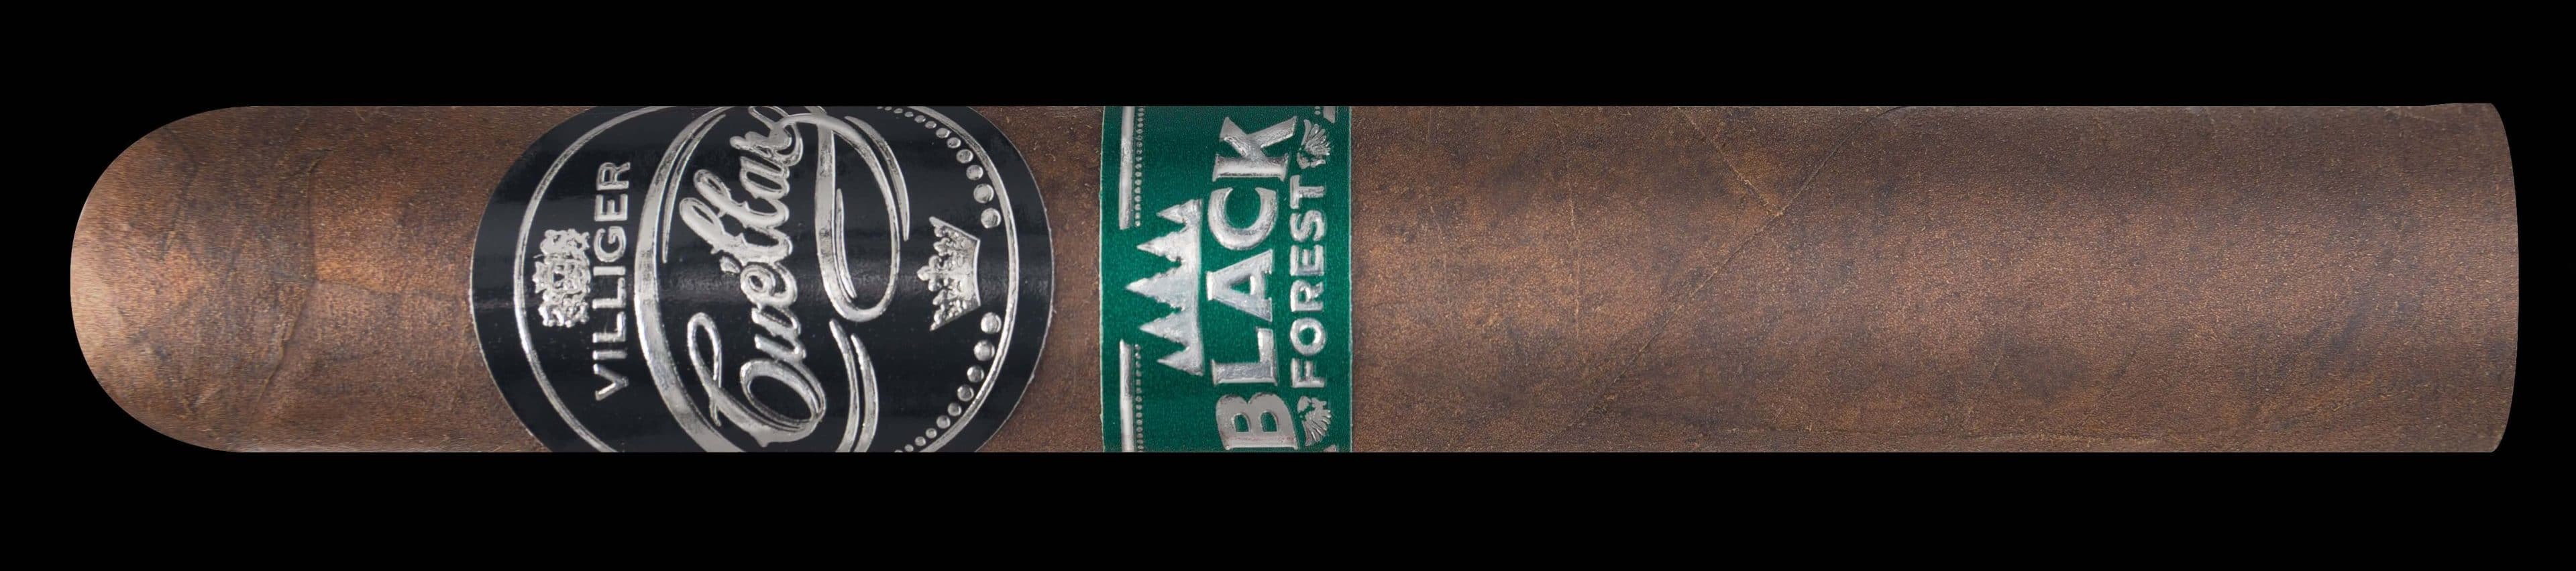 Cigar News: Villiger Announces Cuellar Black Forest